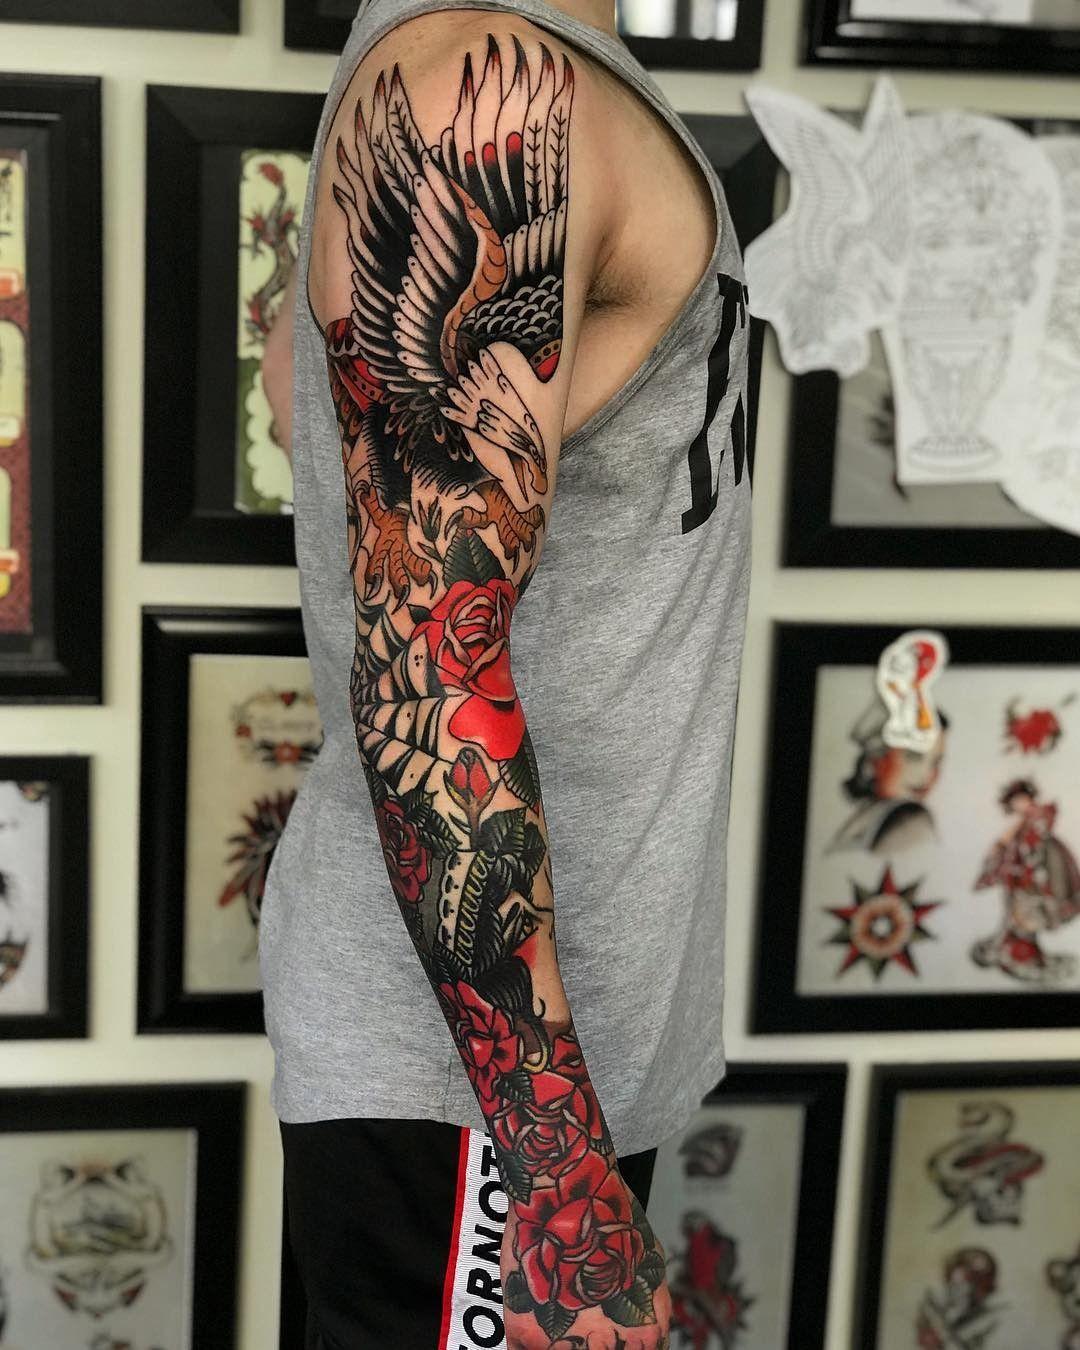 Pin By Joshua On Tatuagem Traditional Tattoo Design Traditional Tattoo Sleeve Music Tattoo Sleeves